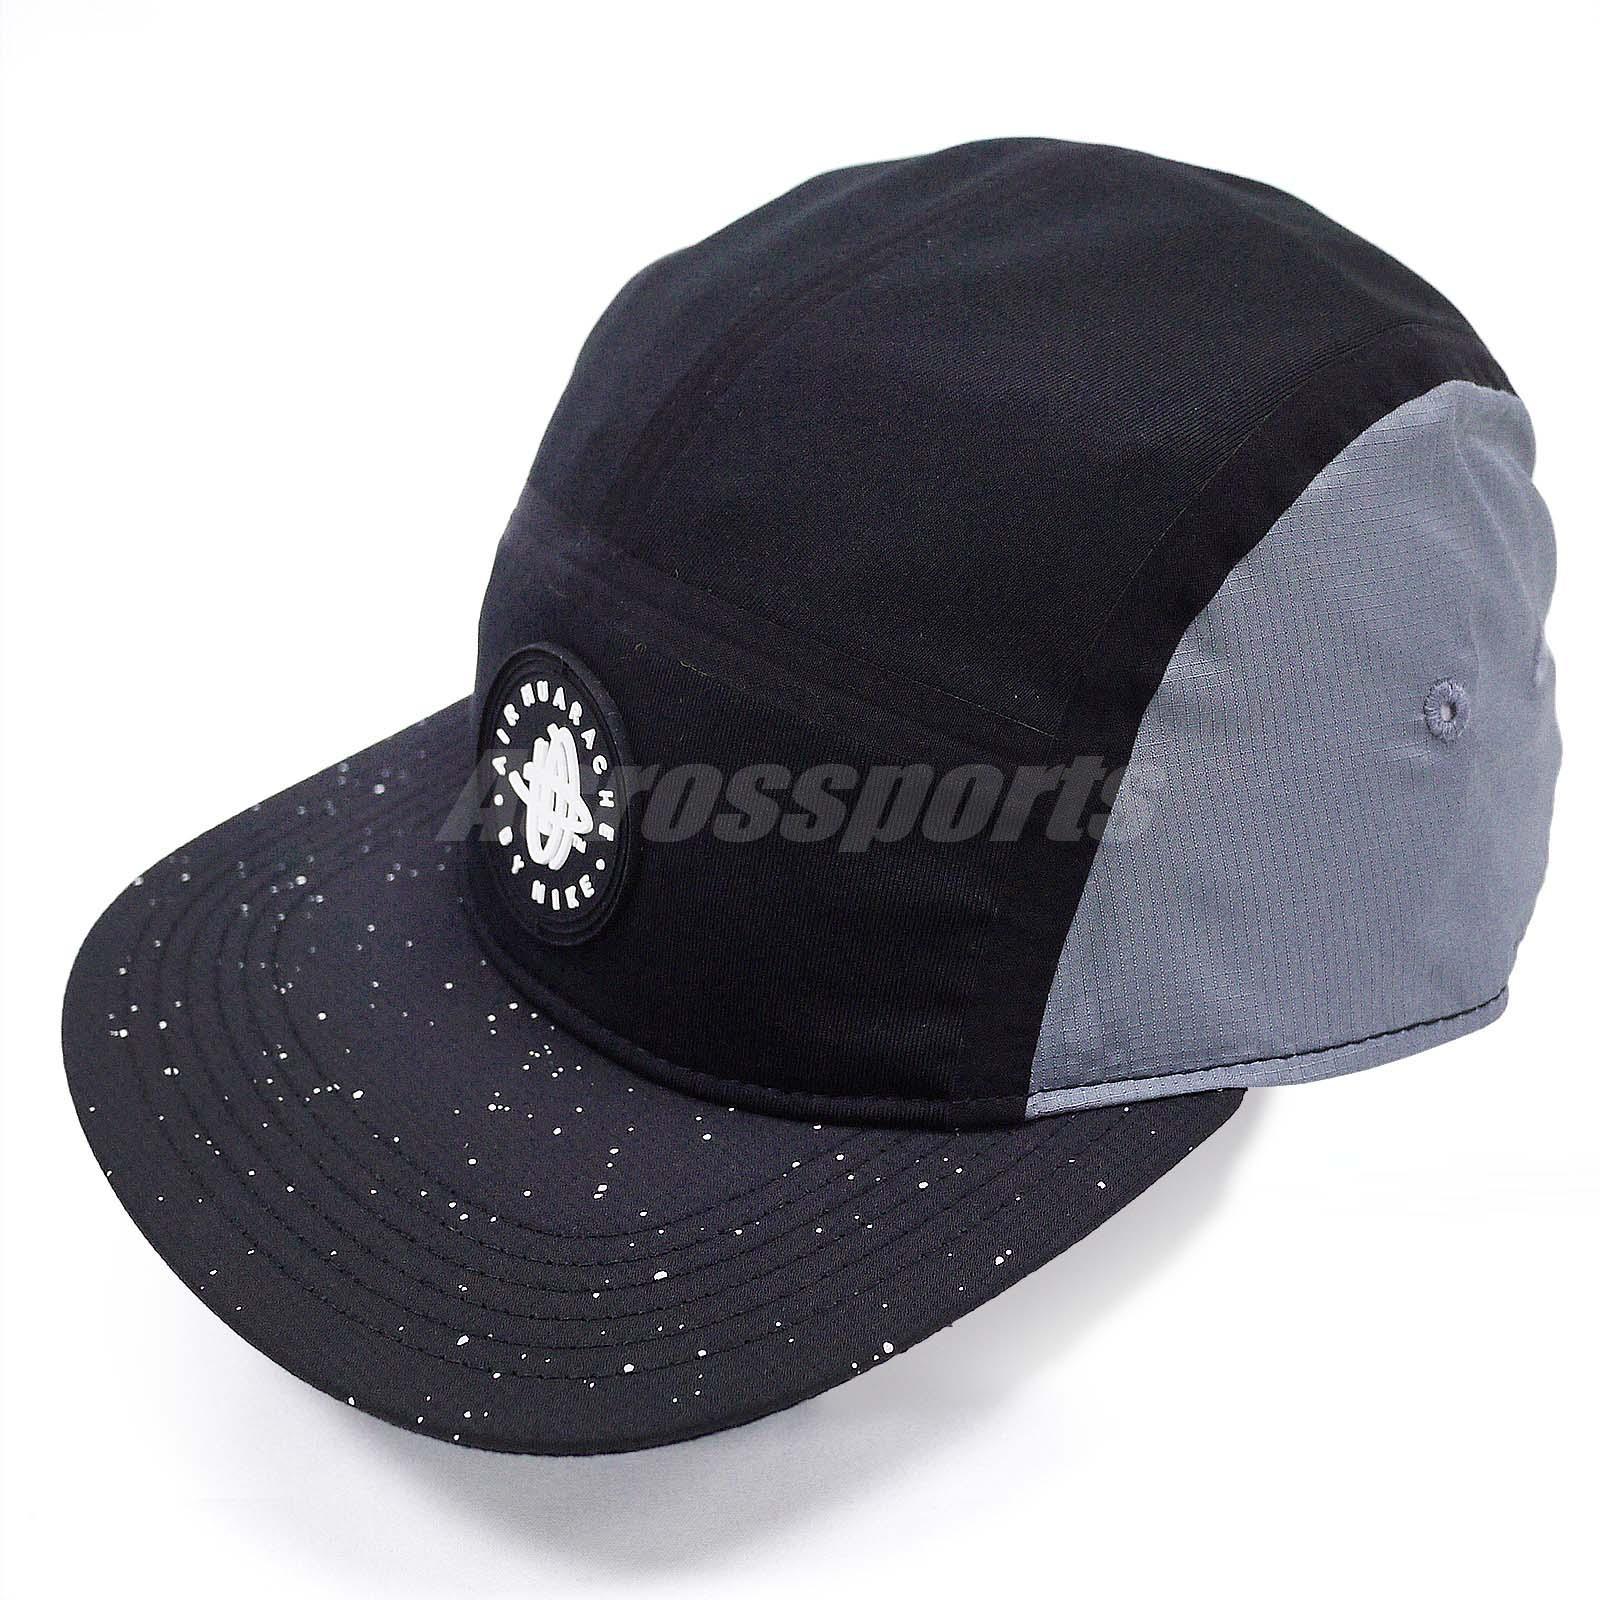 nike huarache aw84 black grey mens womens 5 panel caps hat